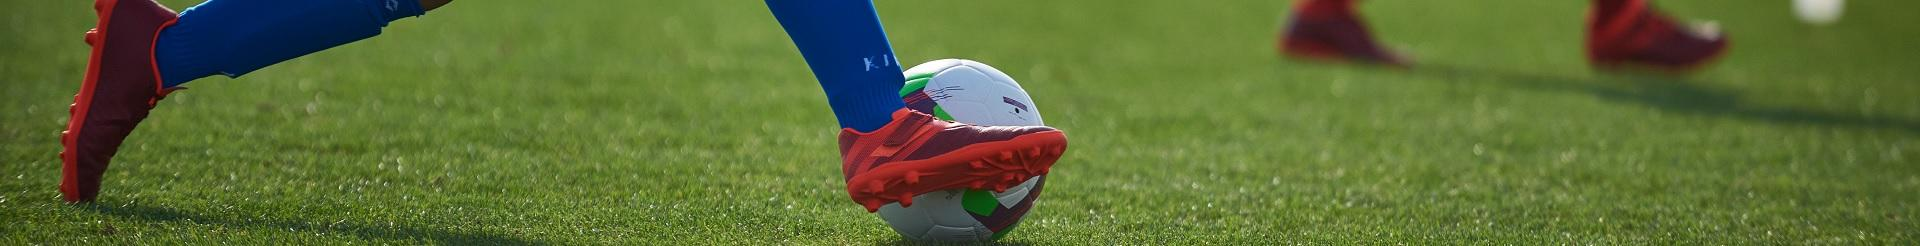 Kids' Football shoes